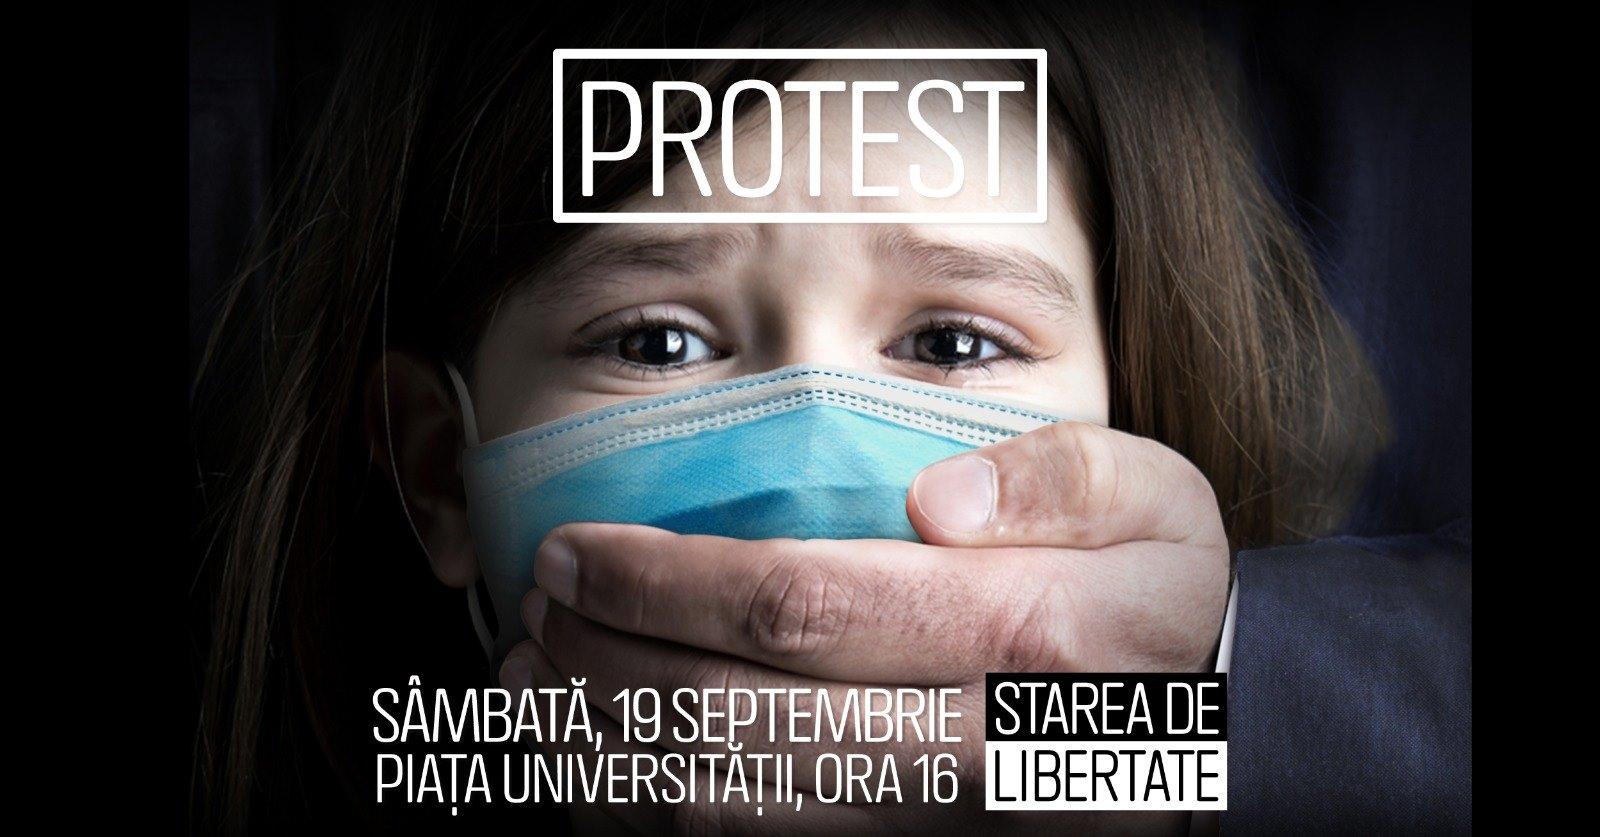 protest-covid-coronavirus-bucuresti-piata-universitatii-copii-fara-masti-la-scoala-19-septembrie-2020-01